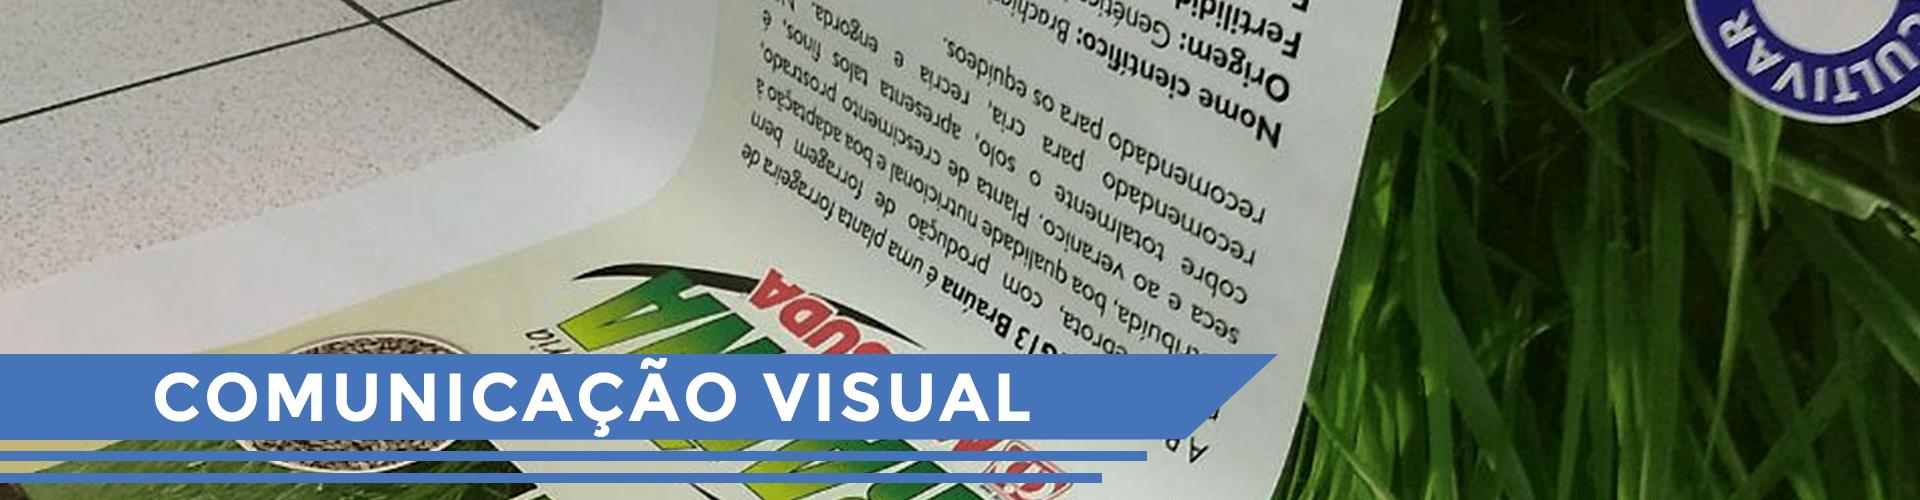 banner-vitrine-comunicacao-visual